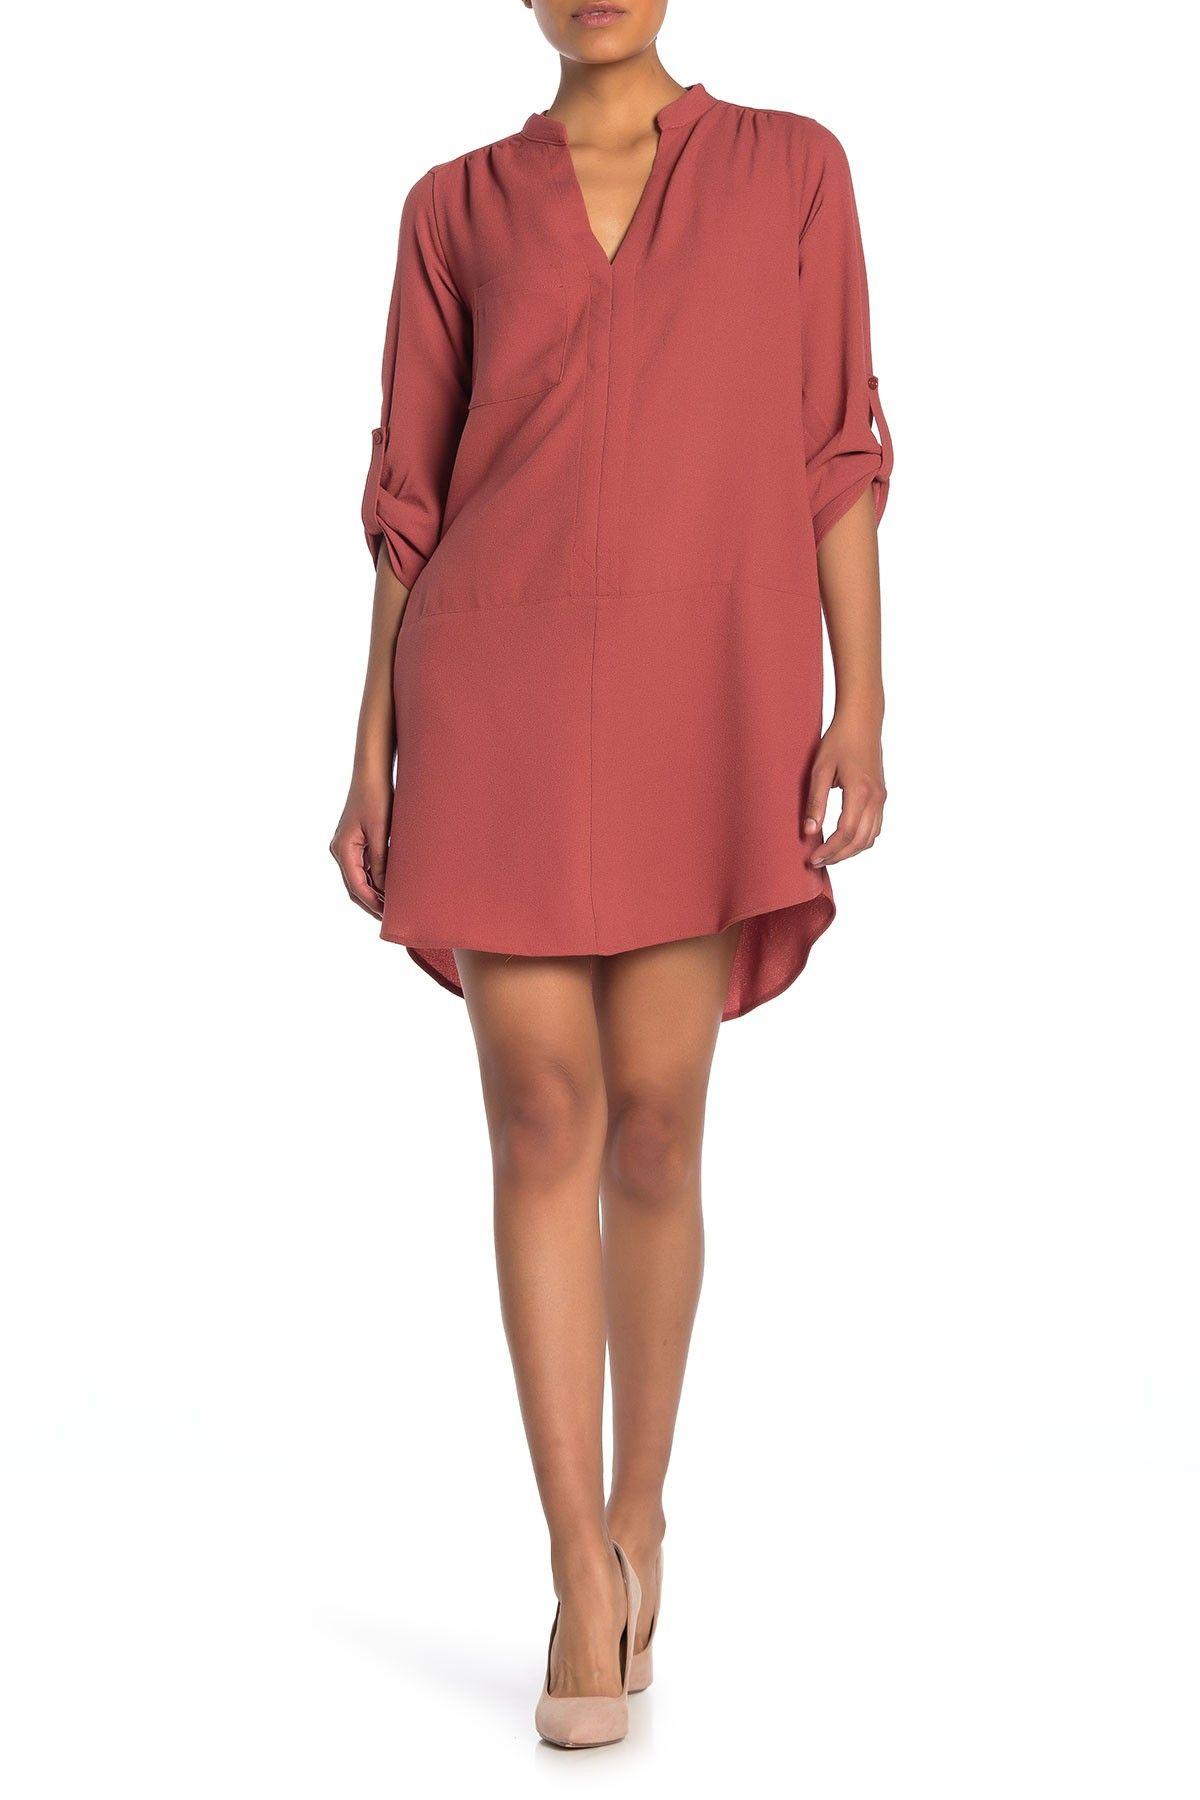 Lush Novak 3 4 Sleeve Shift Dress Hautelook Shift Dress Classic Shirt Dress Nordstrom Dresses [ 1800 x 1200 Pixel ]